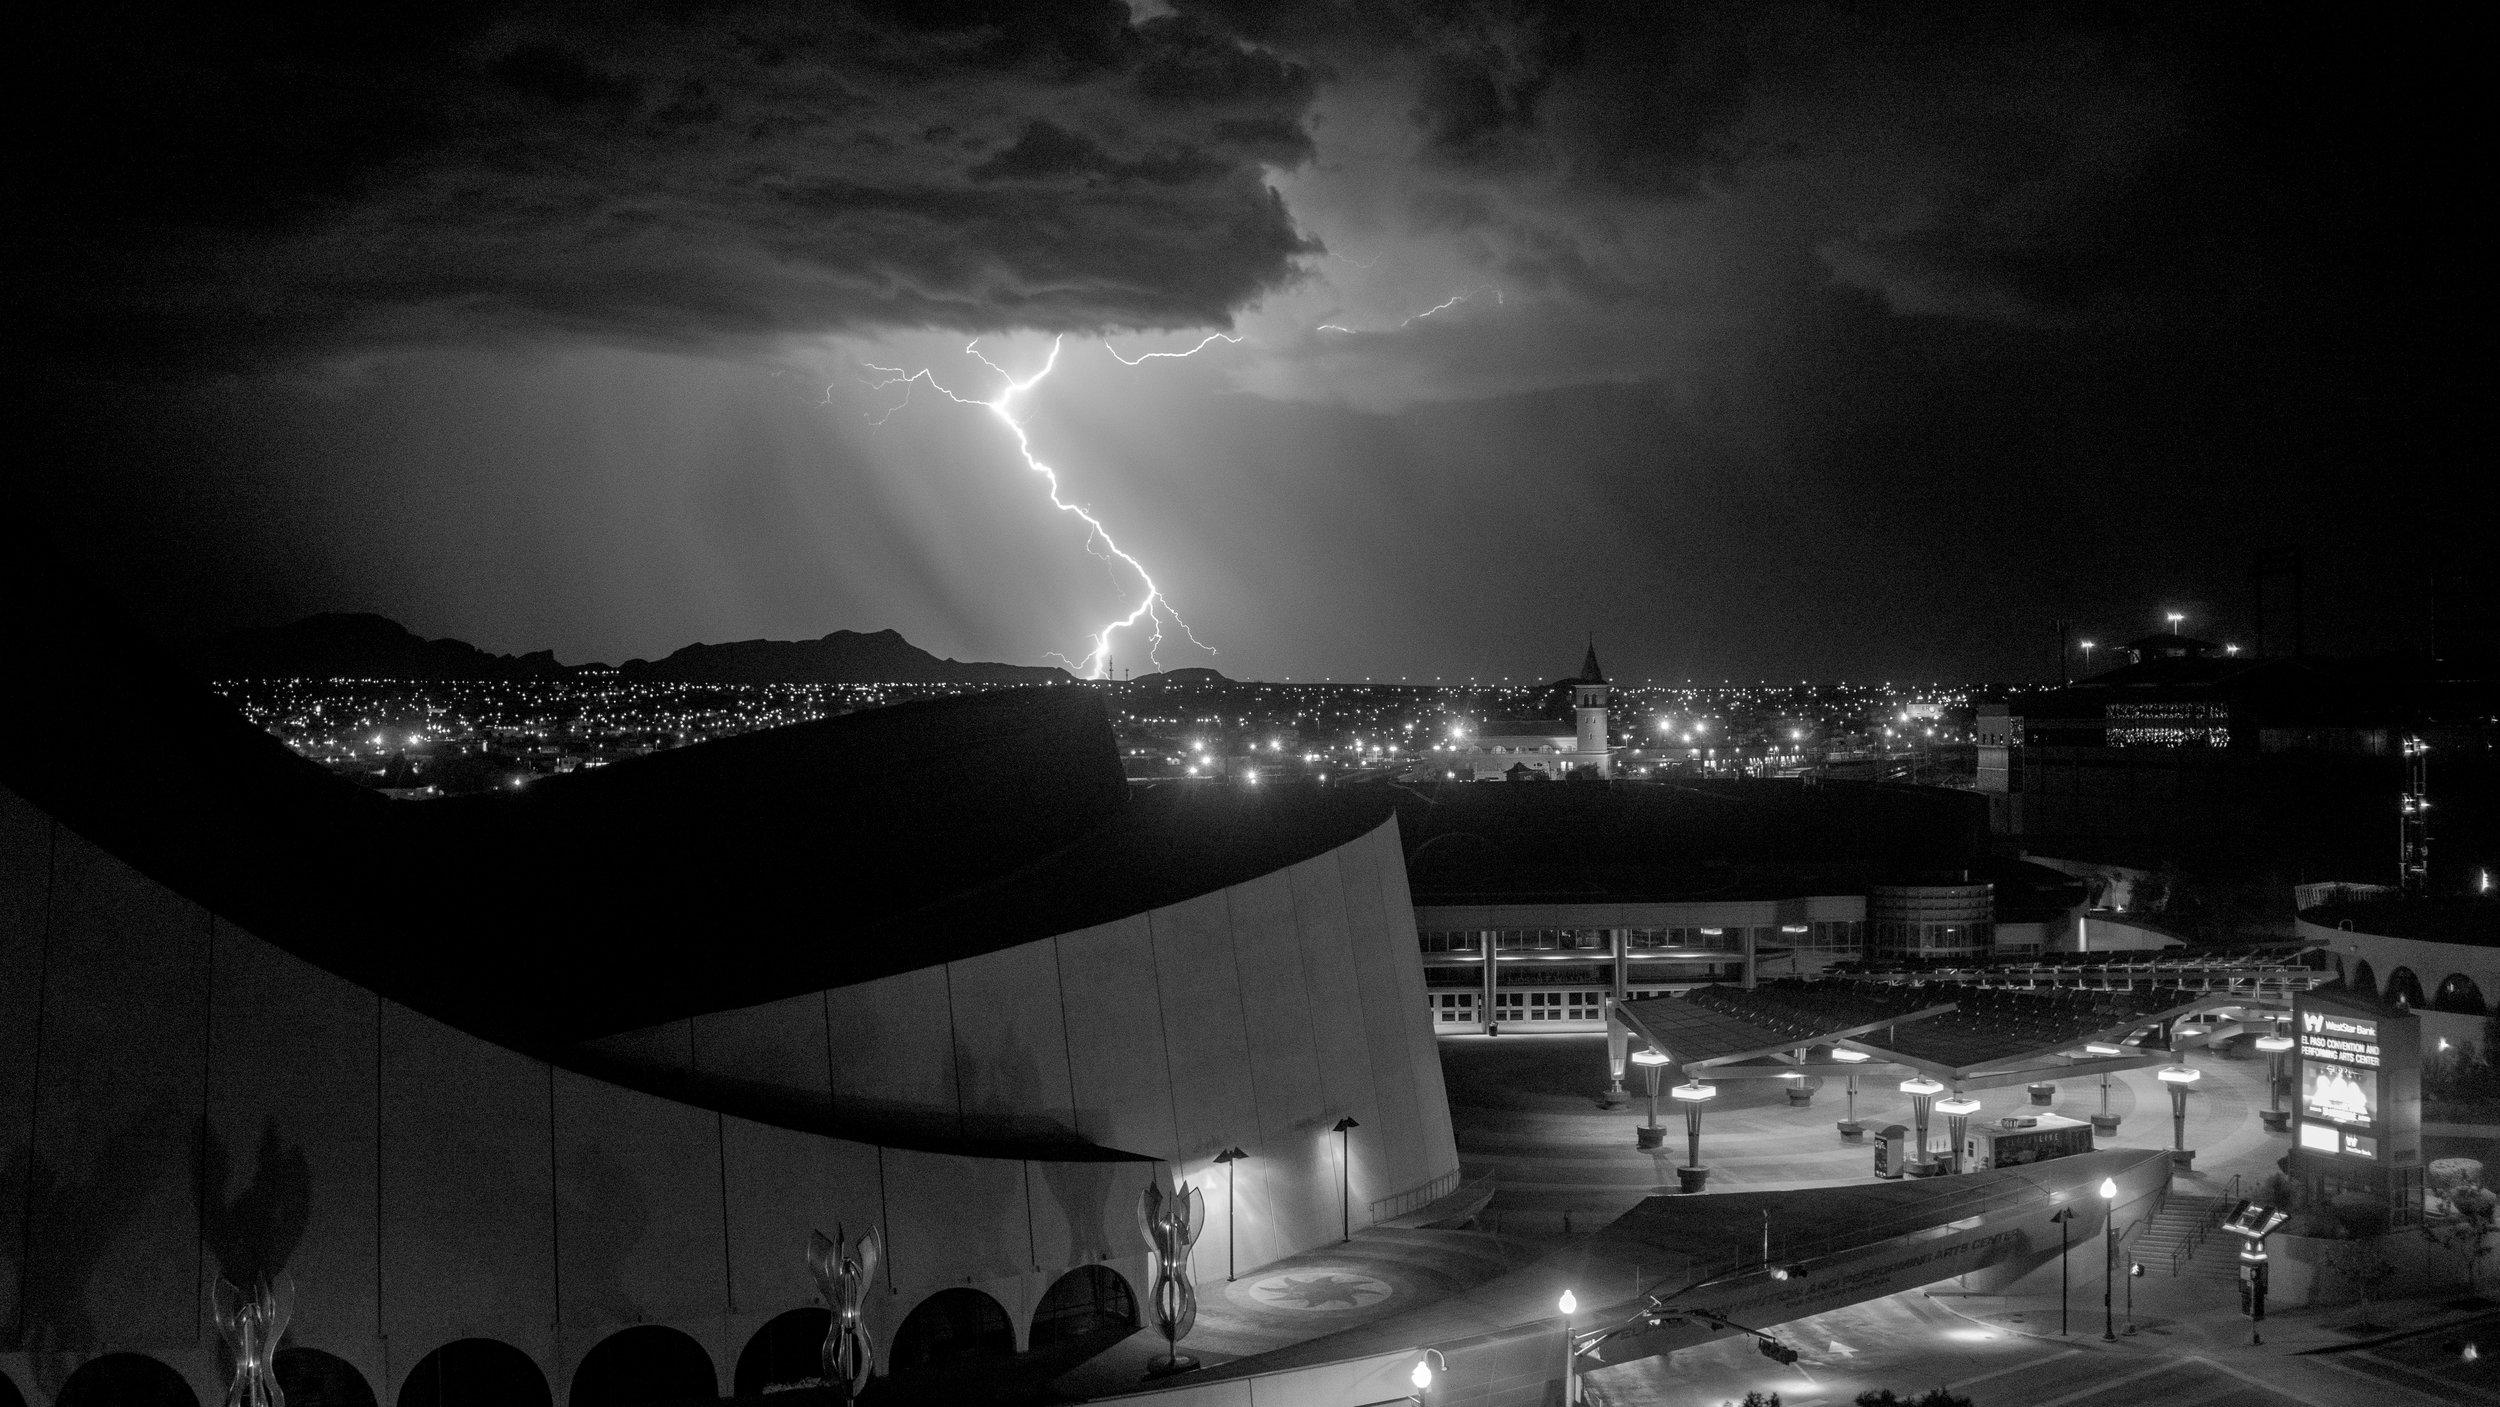 LIGHTNING IN TEXAS, AUGUST 2016